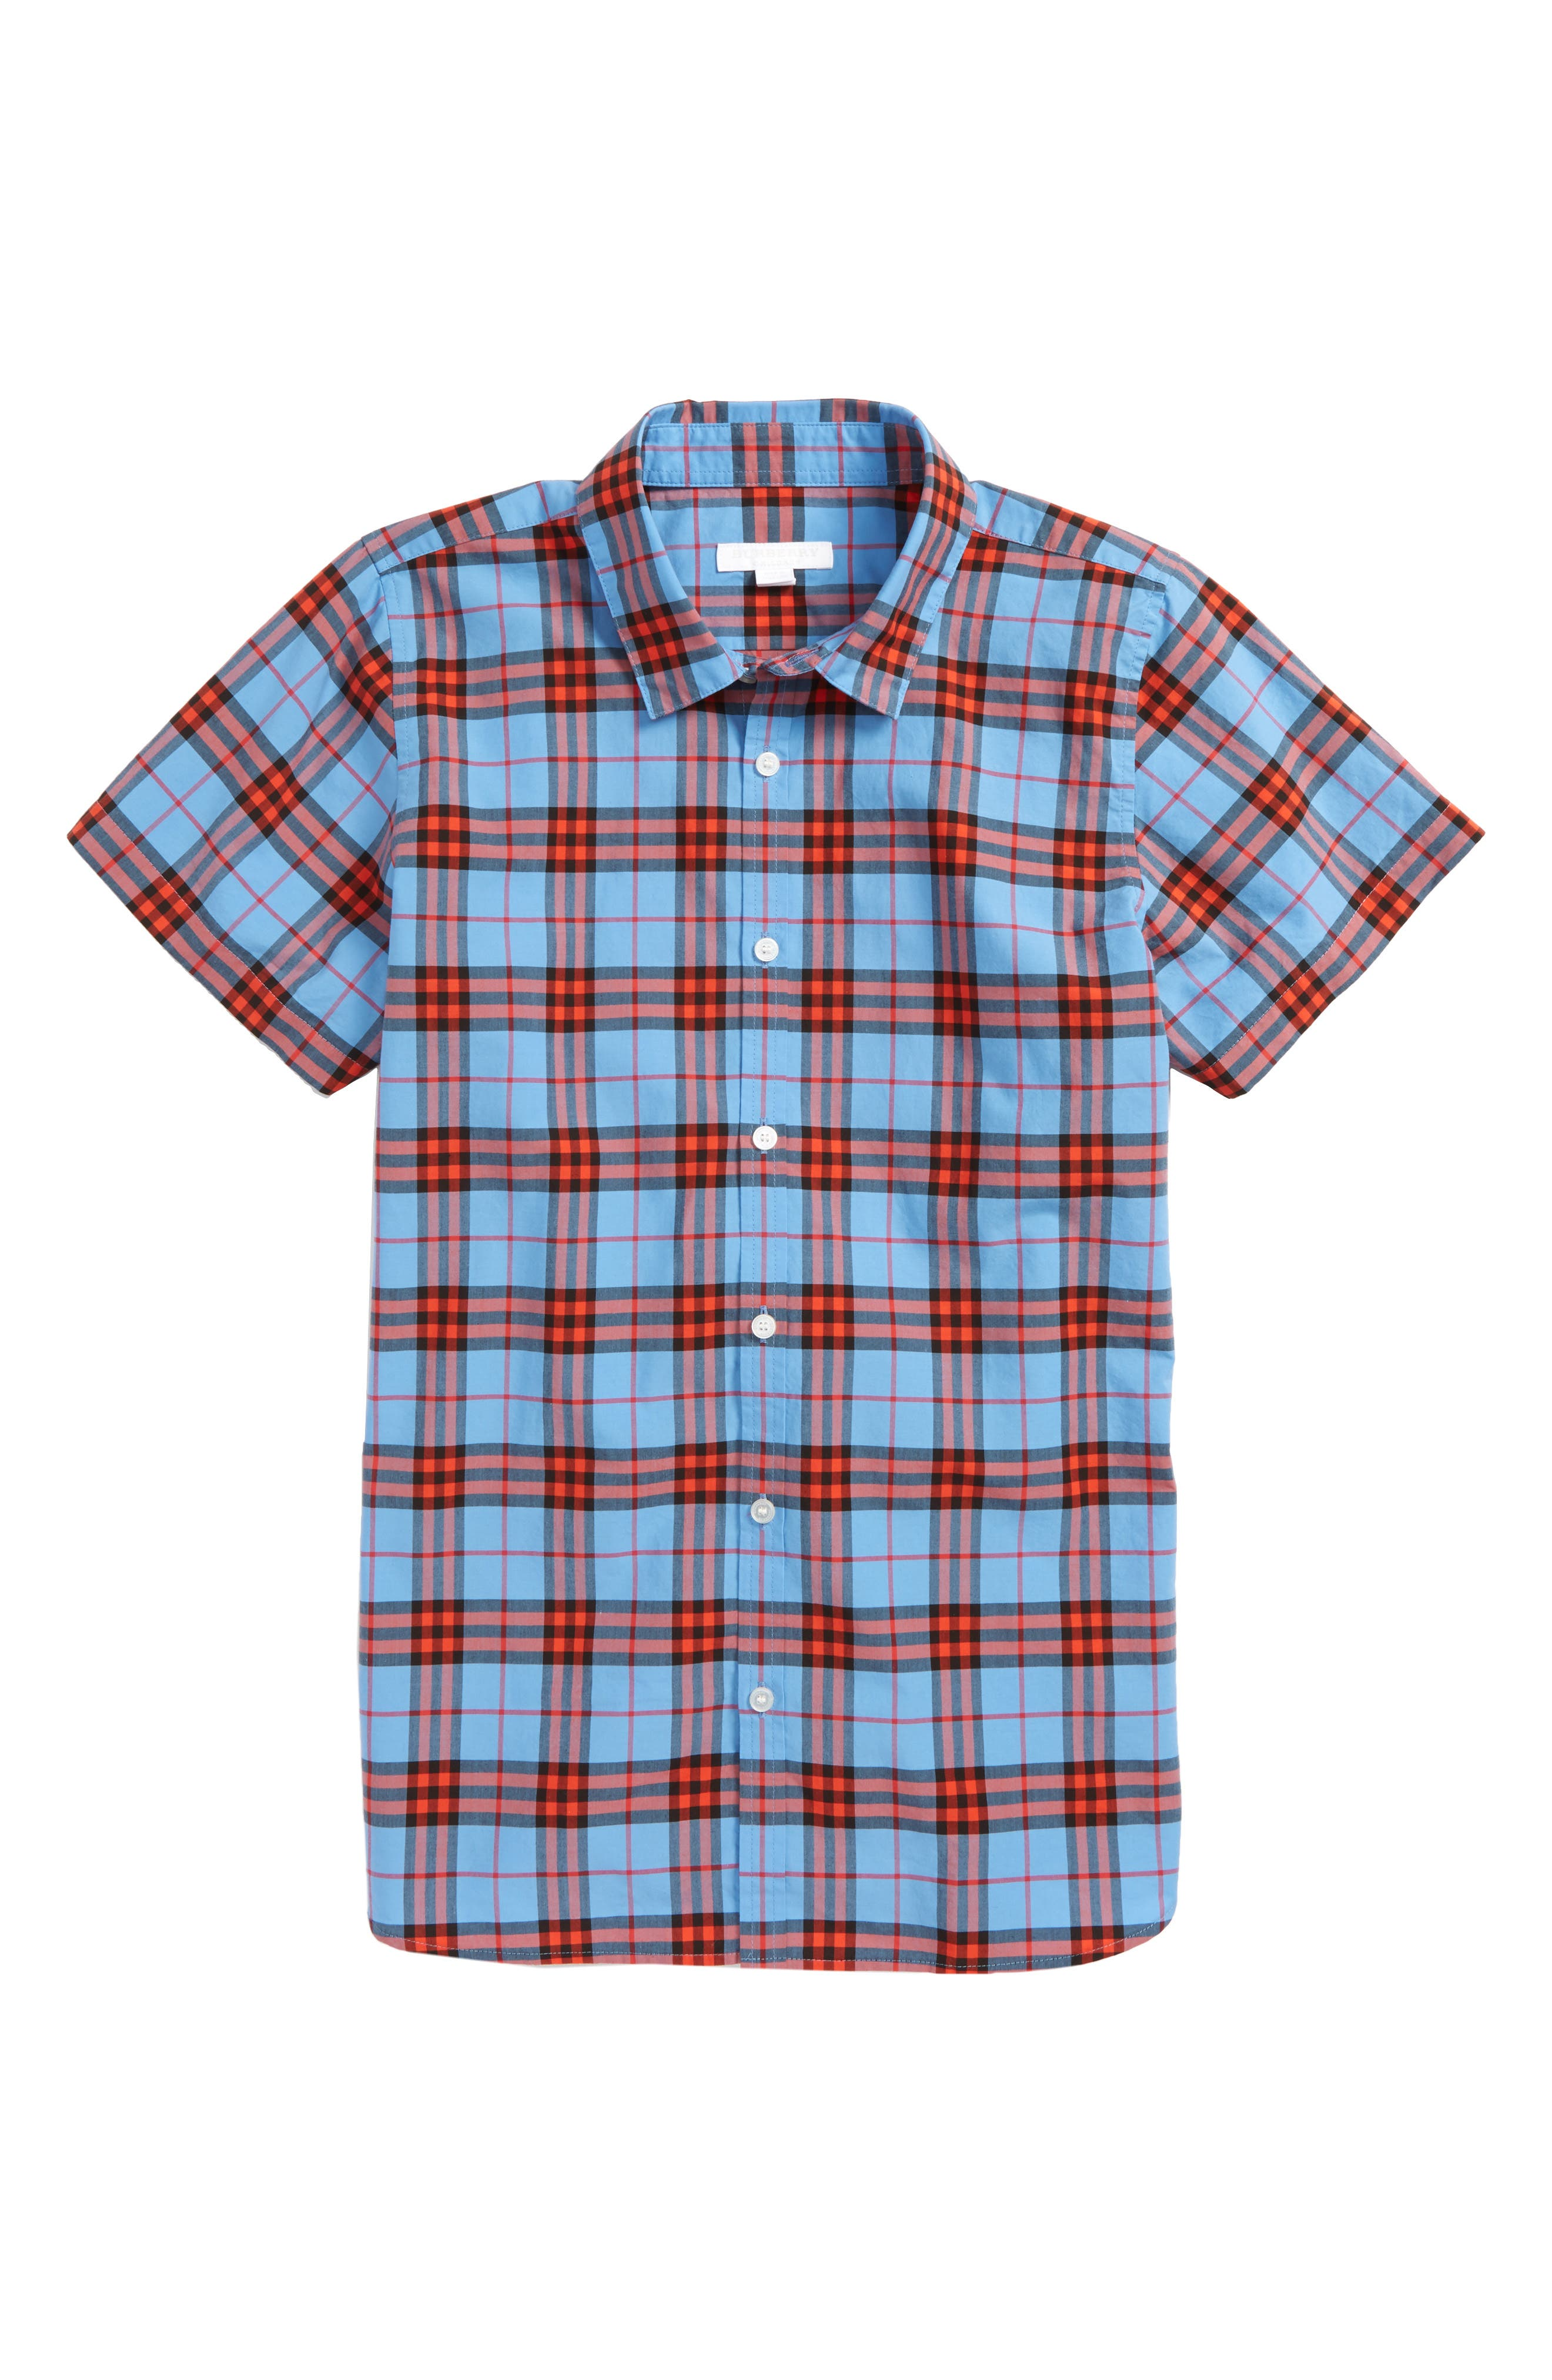 Clarkey Plaid Woven Shirt,                         Main,                         color, 428